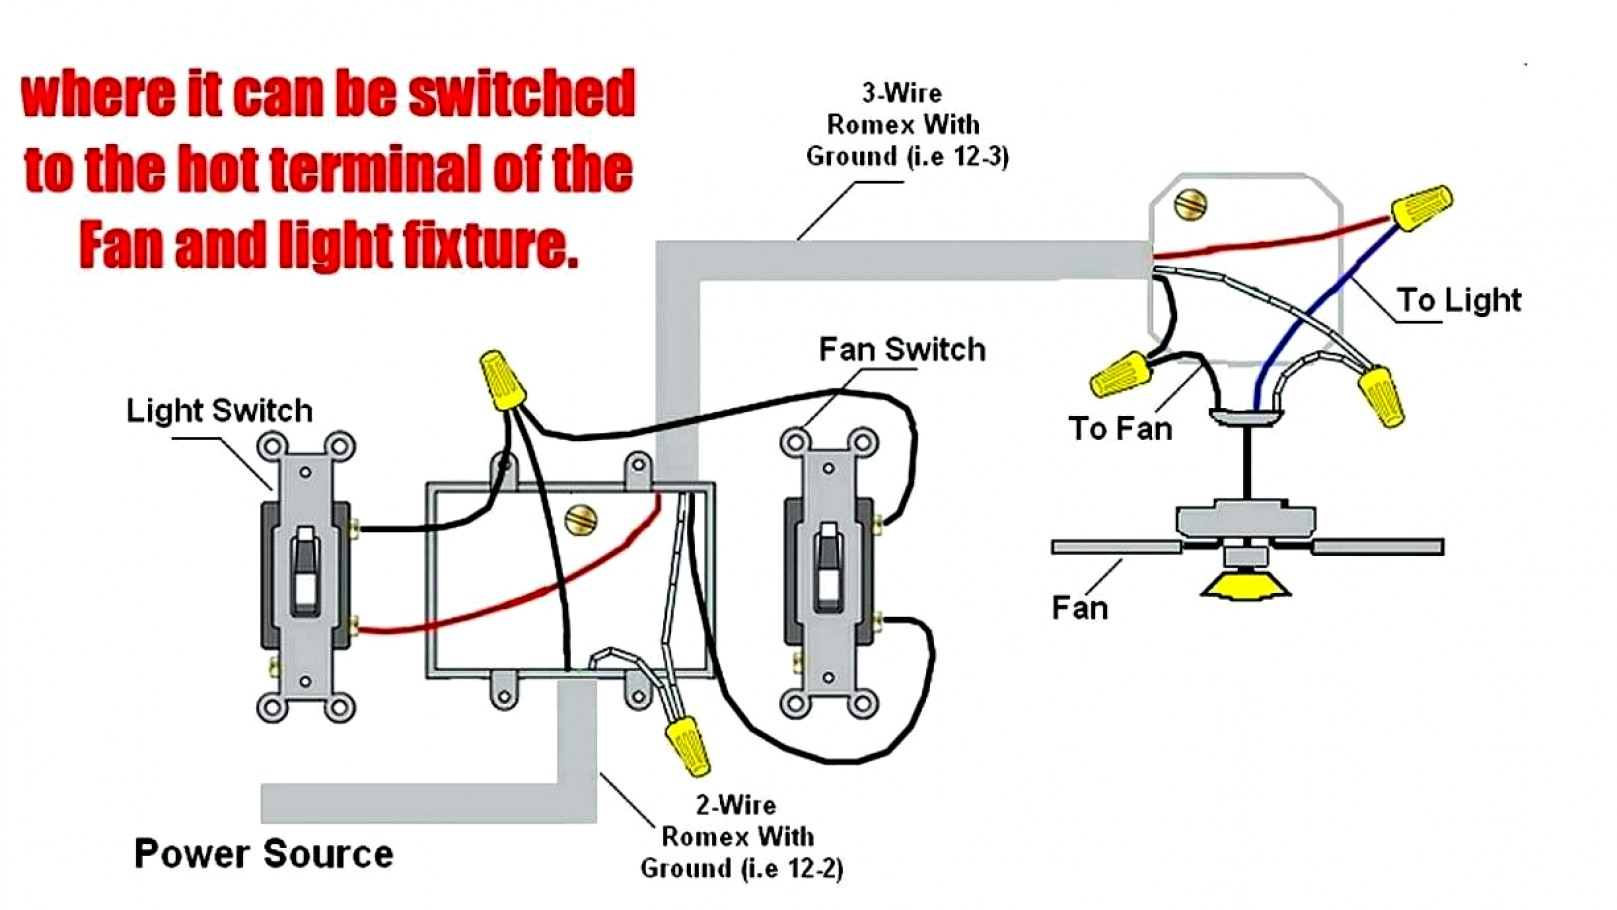 Two Switch Ceiling Fan Wiring Diagram - Go Wiring Diagram - Wiring Diagram For Ceiling Fan With Lights